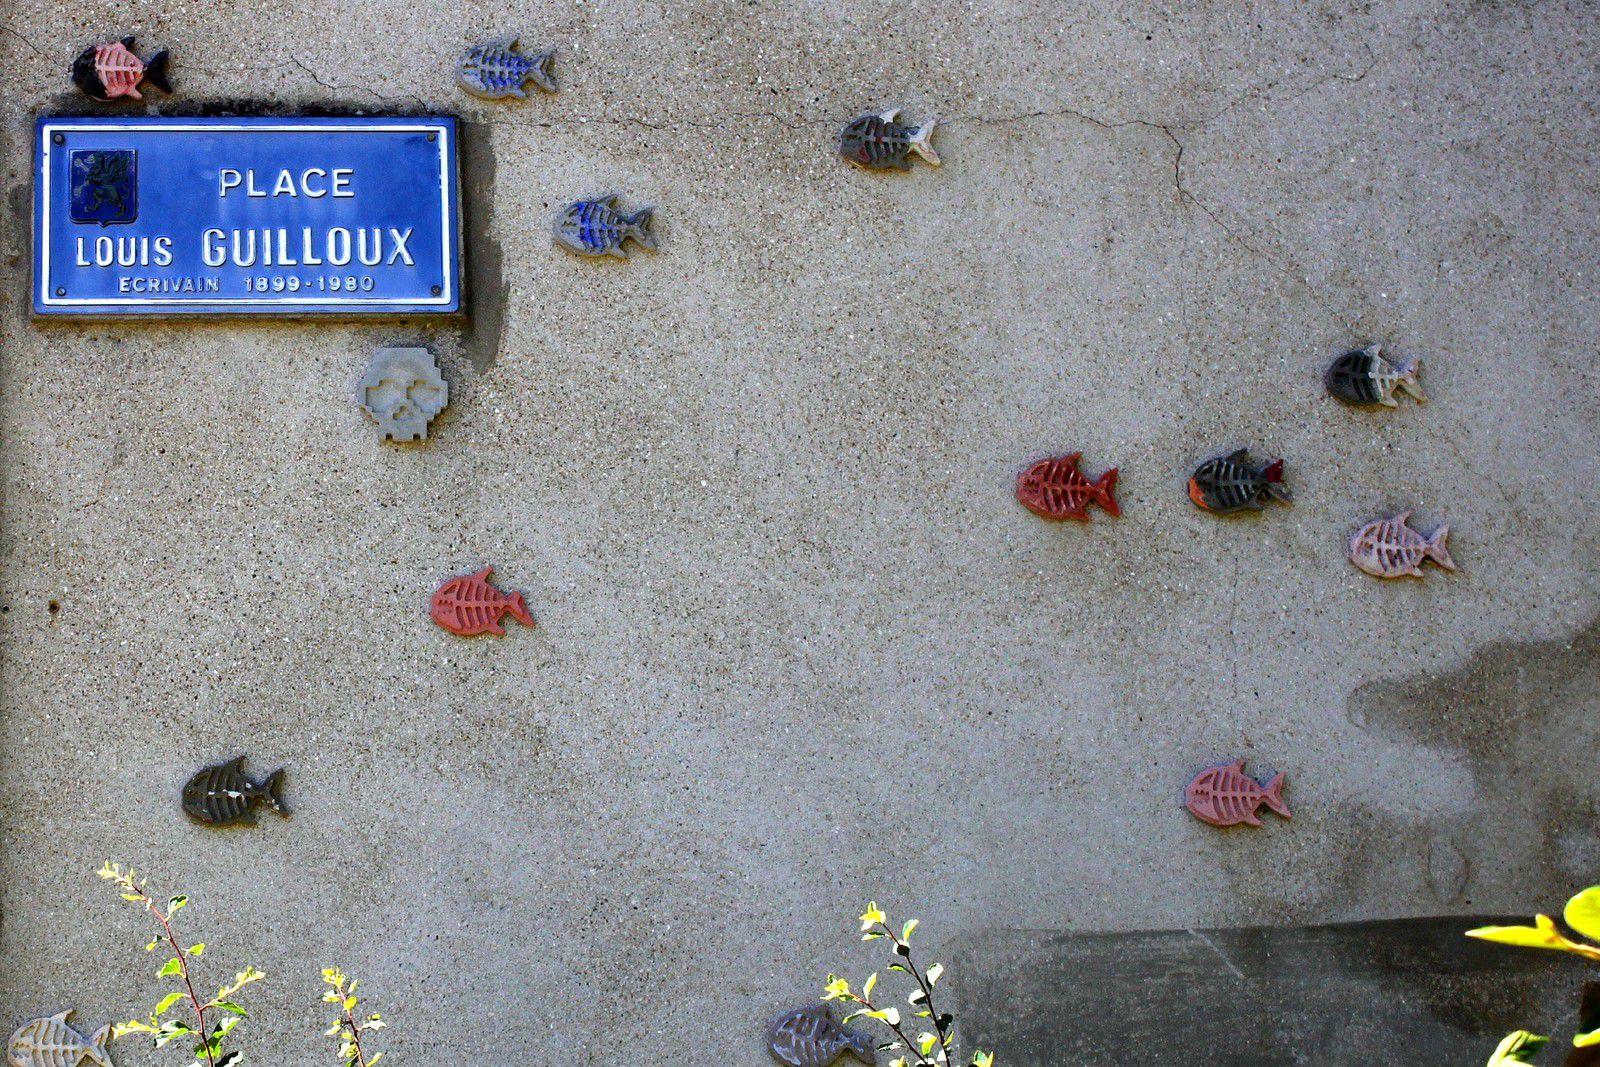 Saint Brieuc (1) - Jeudi 6 août 2020